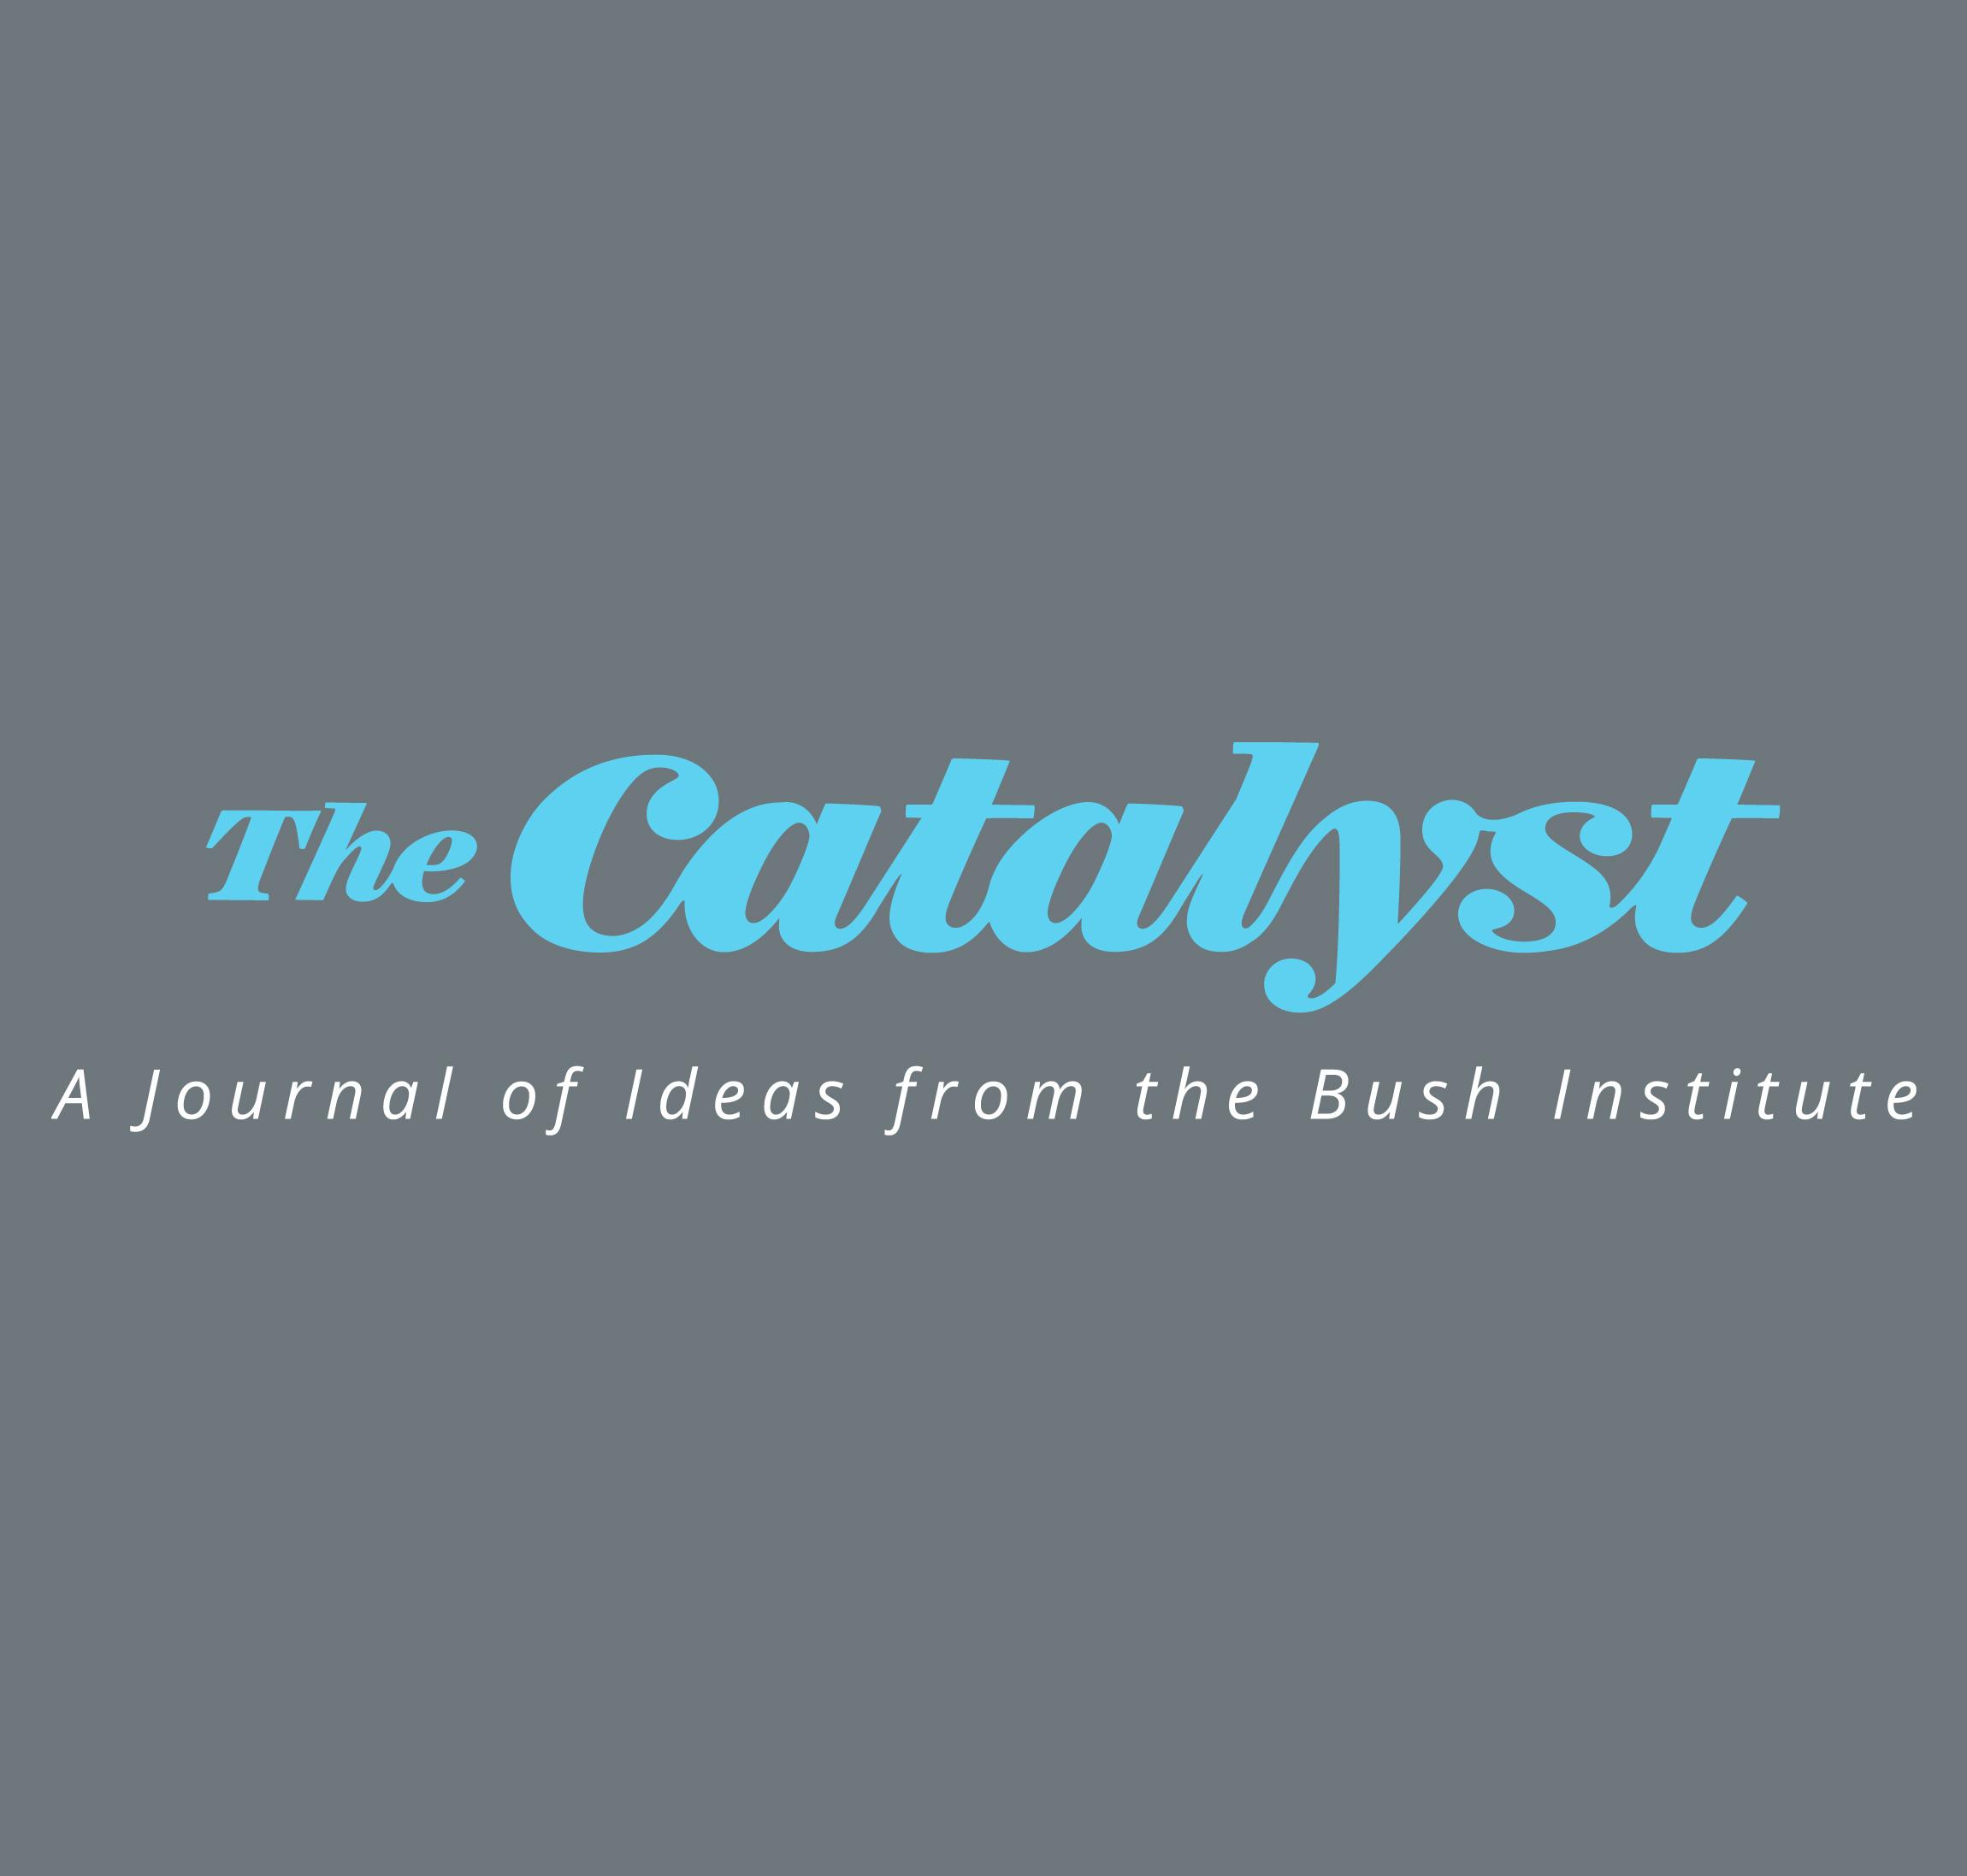 <em>The Catalyst </em> Editorial Board